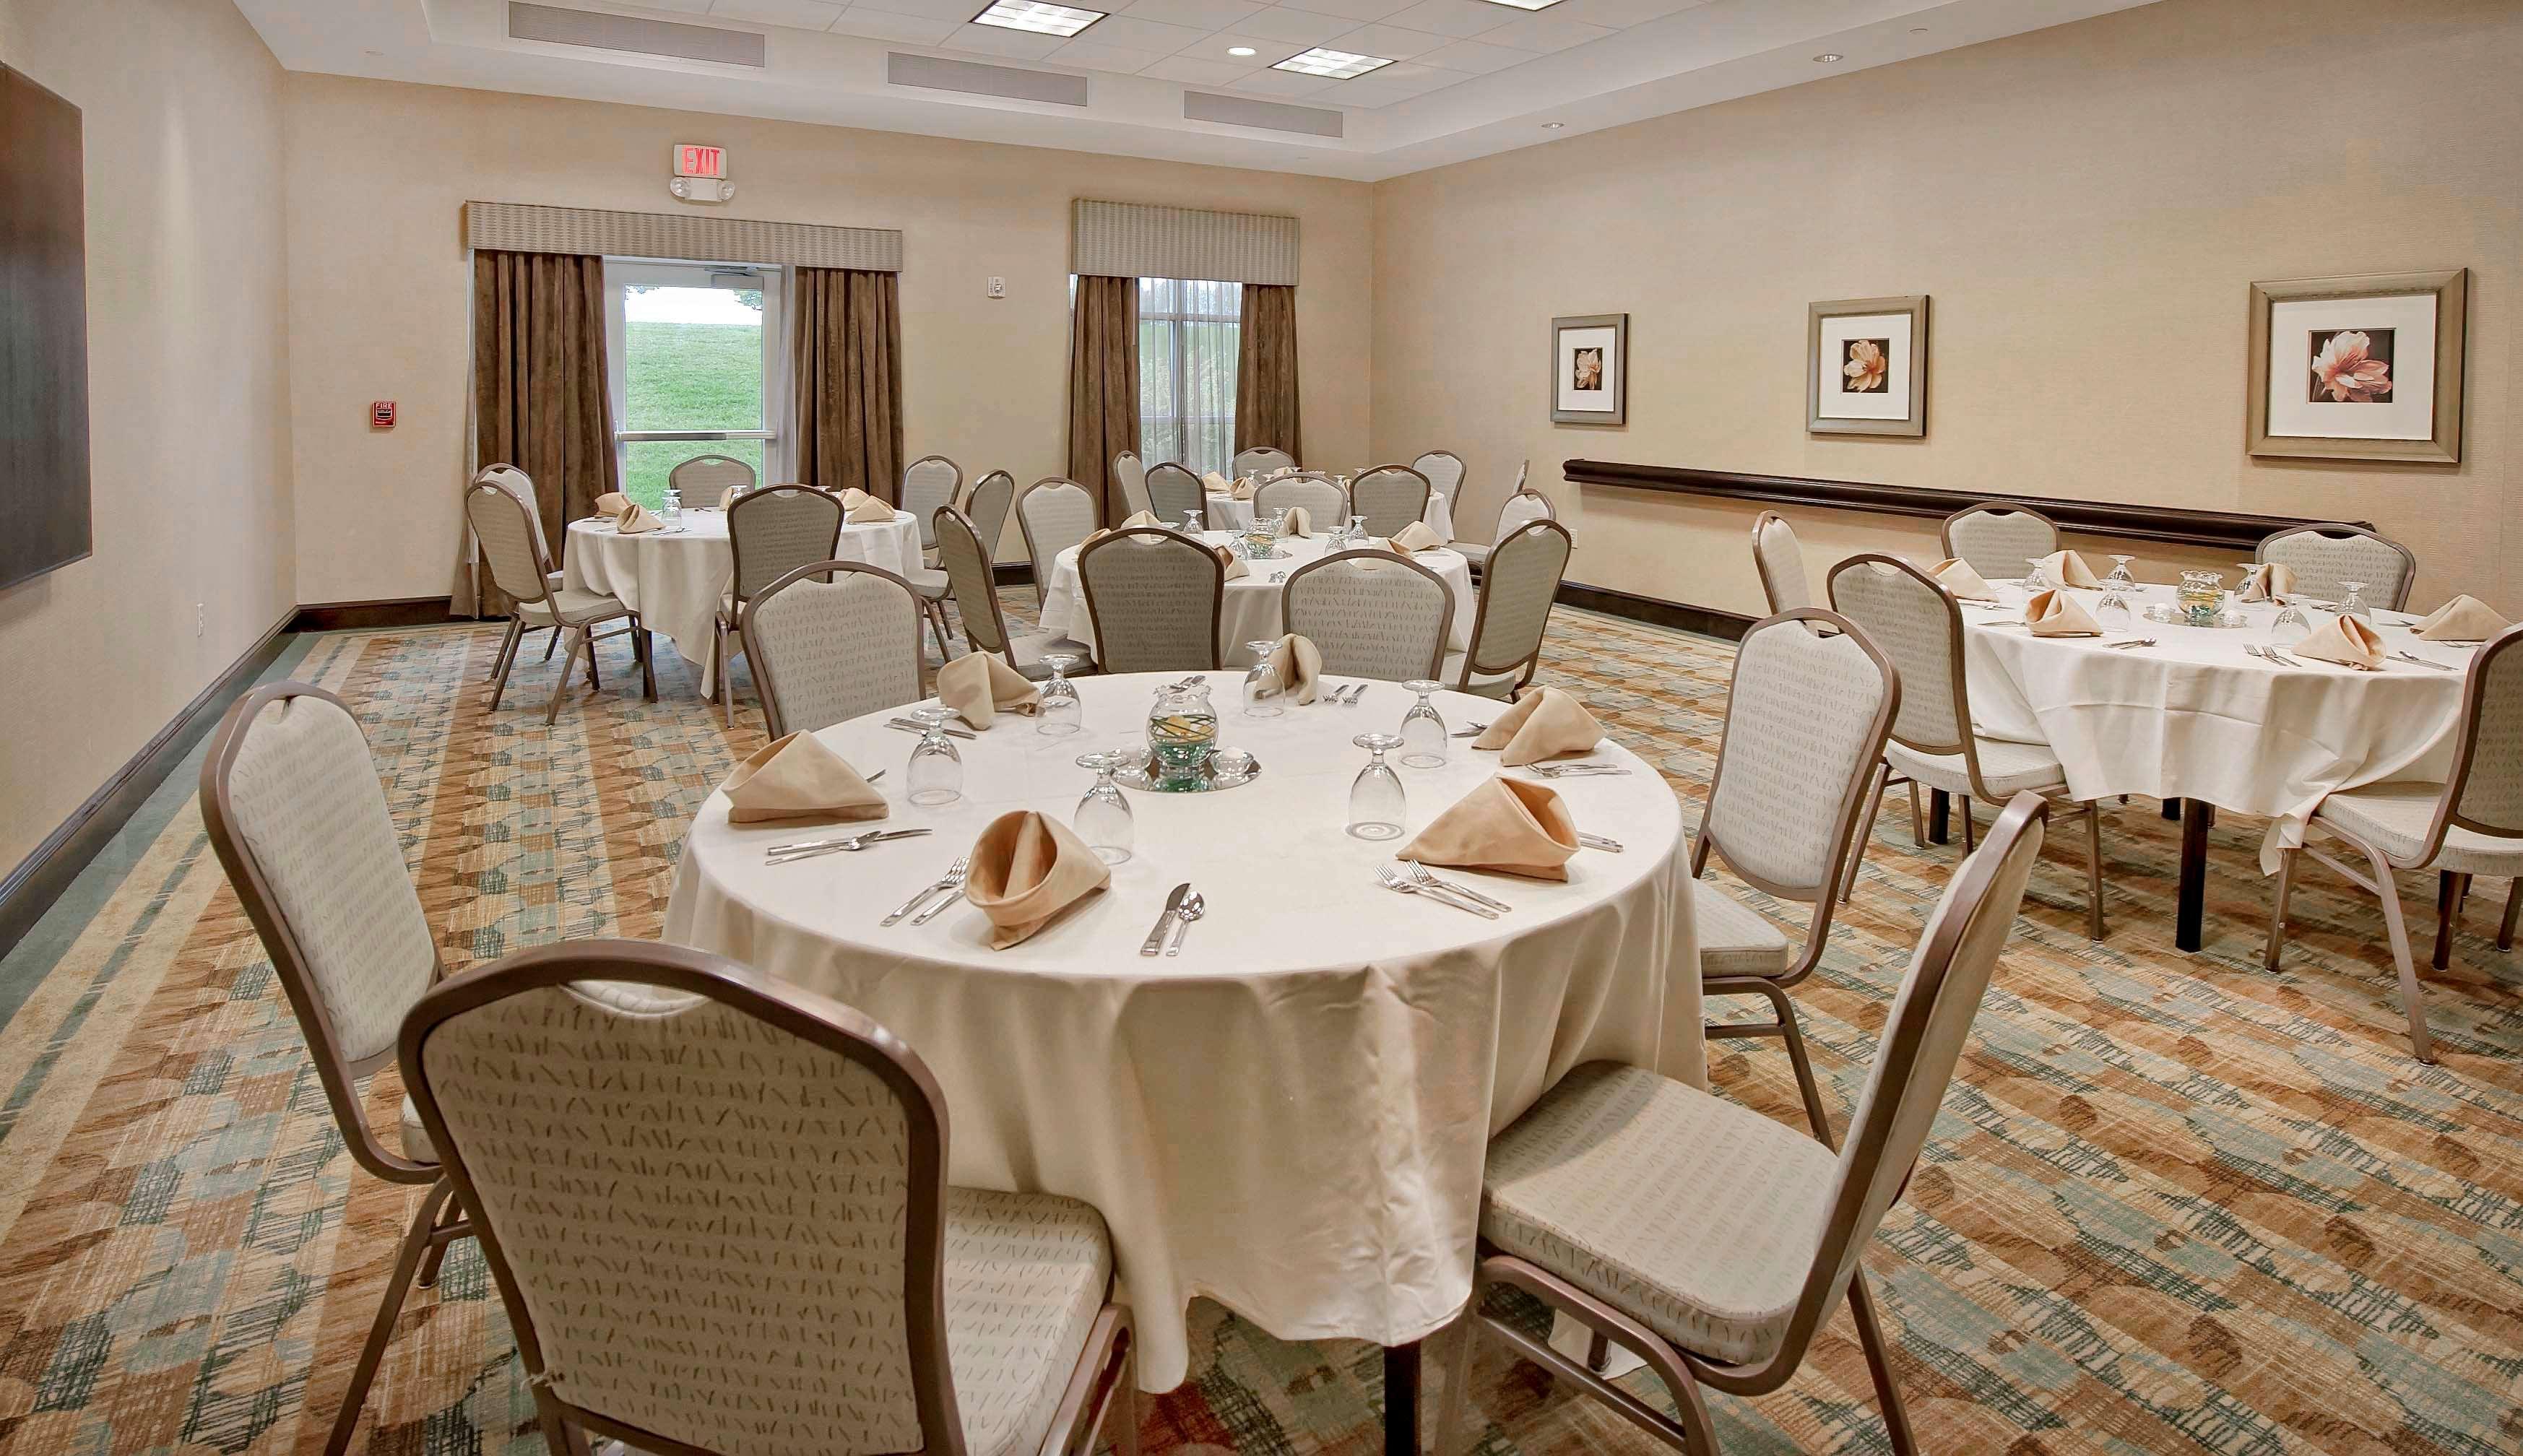 Hilton Garden Inn Durham Southpoint image 44